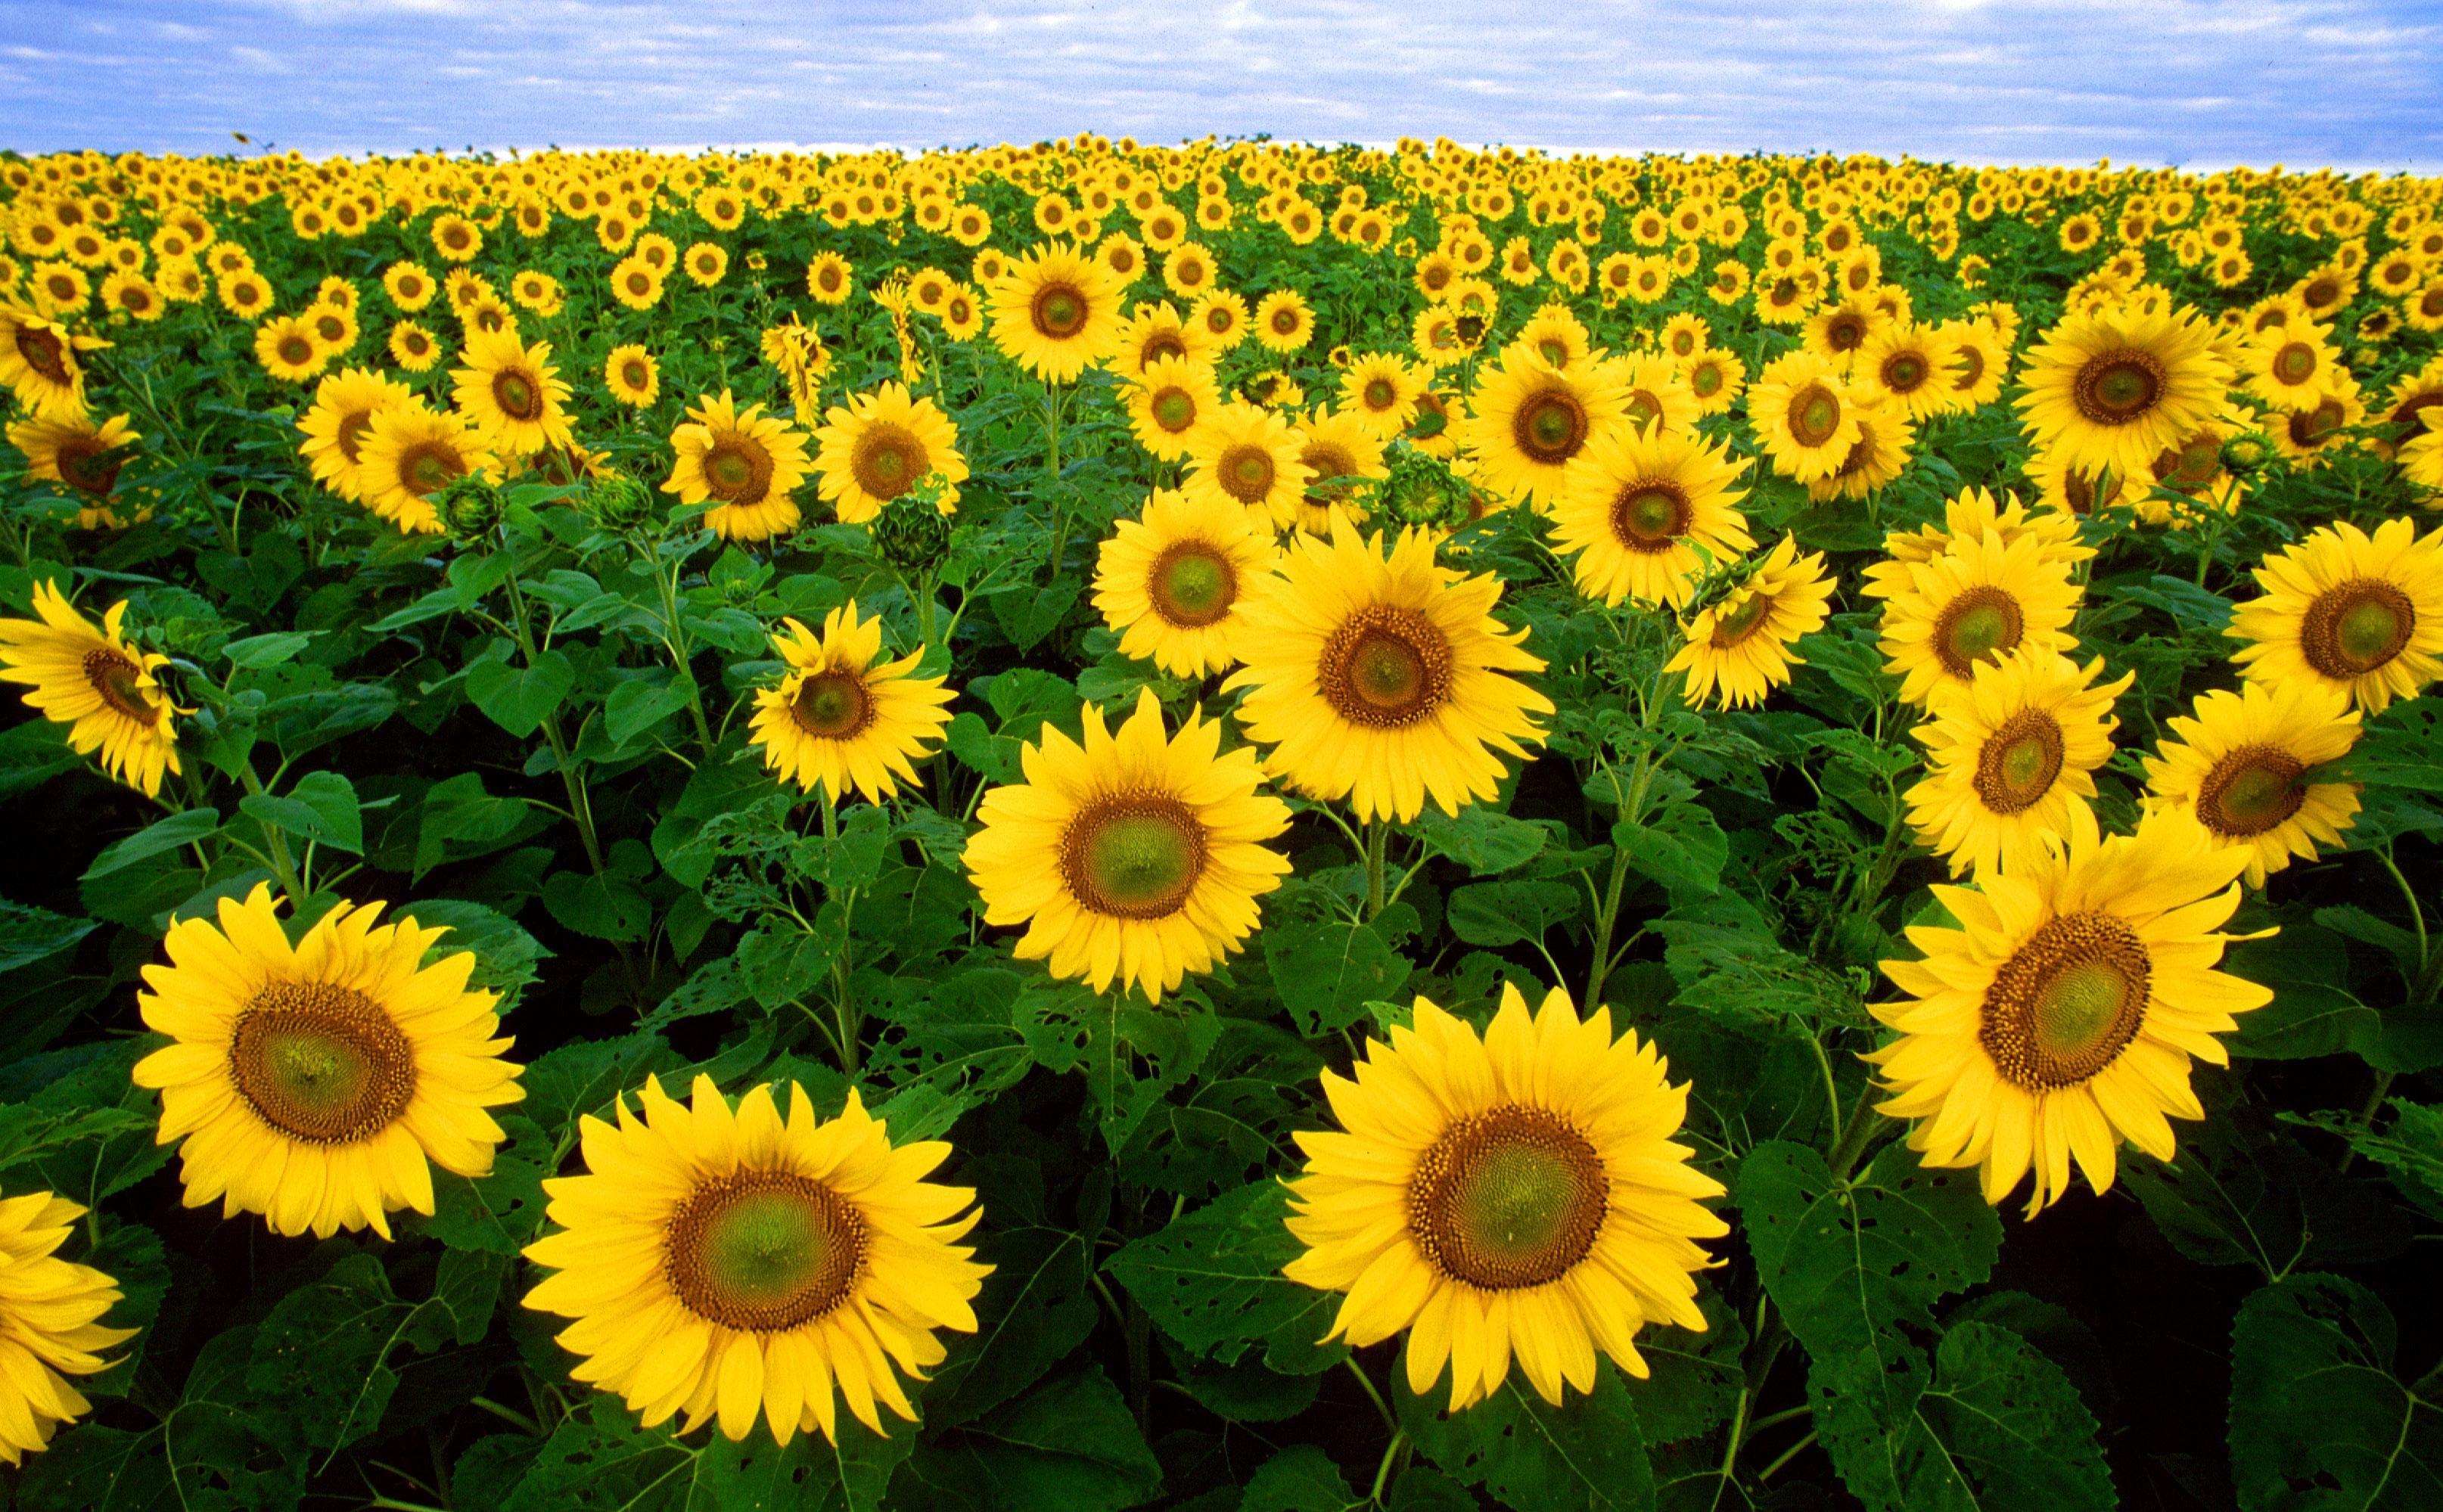 File:Sunflowers helianthus annuus.jpg - Wikimedia Commons